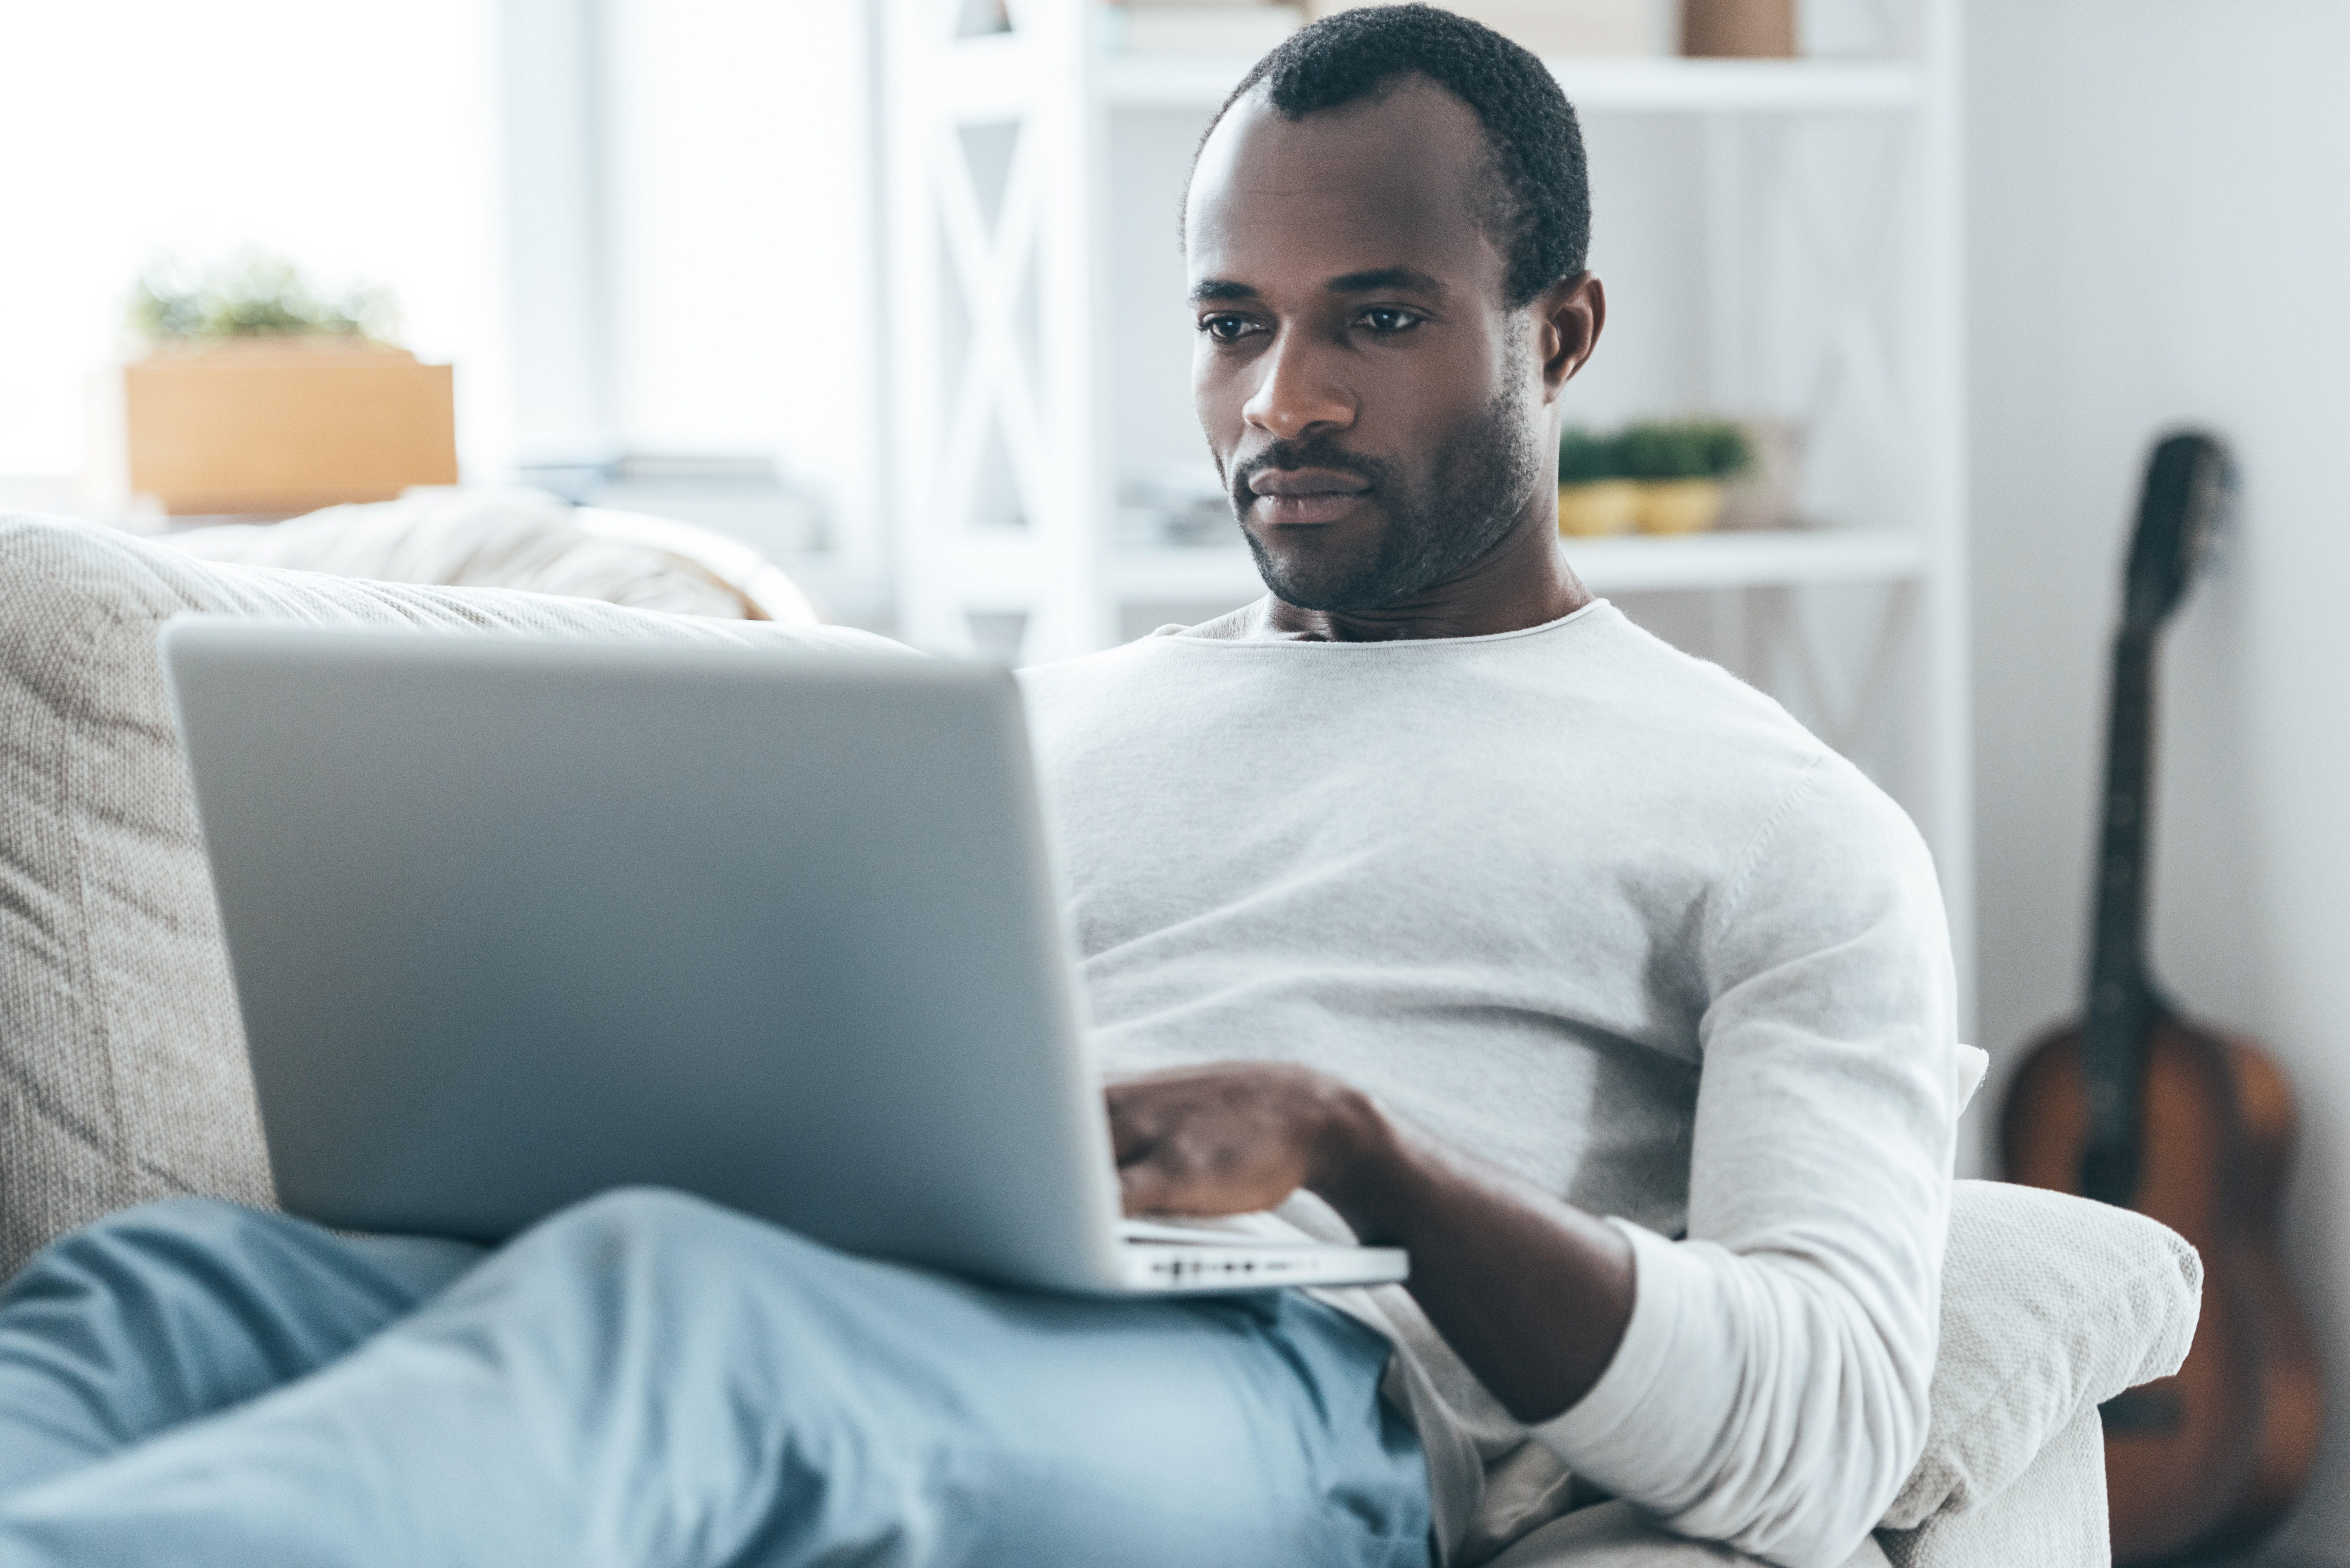 man lounging on sofa looking at laptop